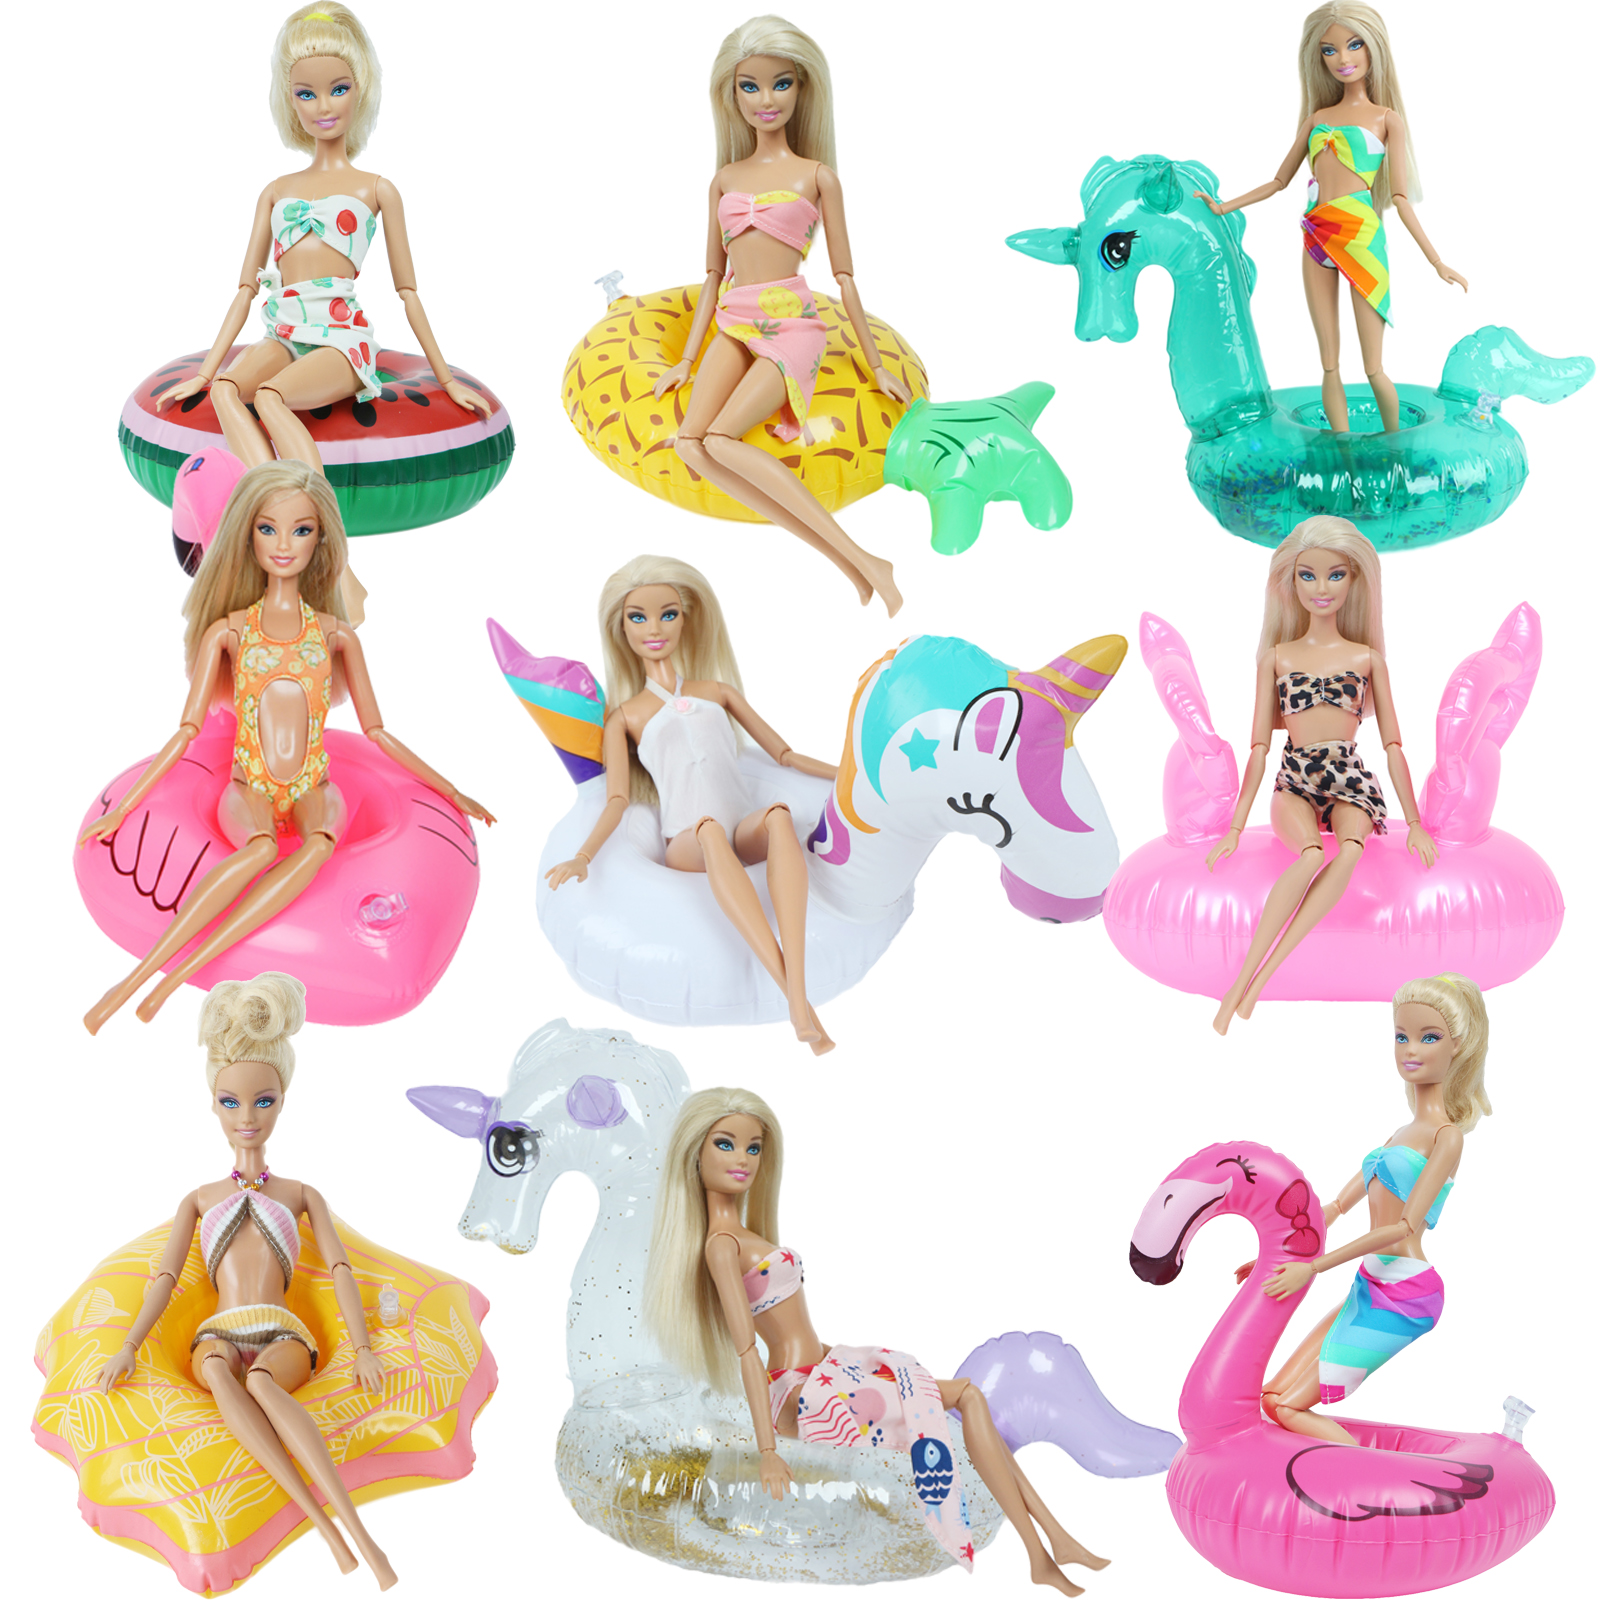 Fashion Handmade Swimsuit Beach Pool Party Wear Bikini Tops Pants Swimwear + Cute Swim Ring Clothes For Barbie Doll Accessories(China)